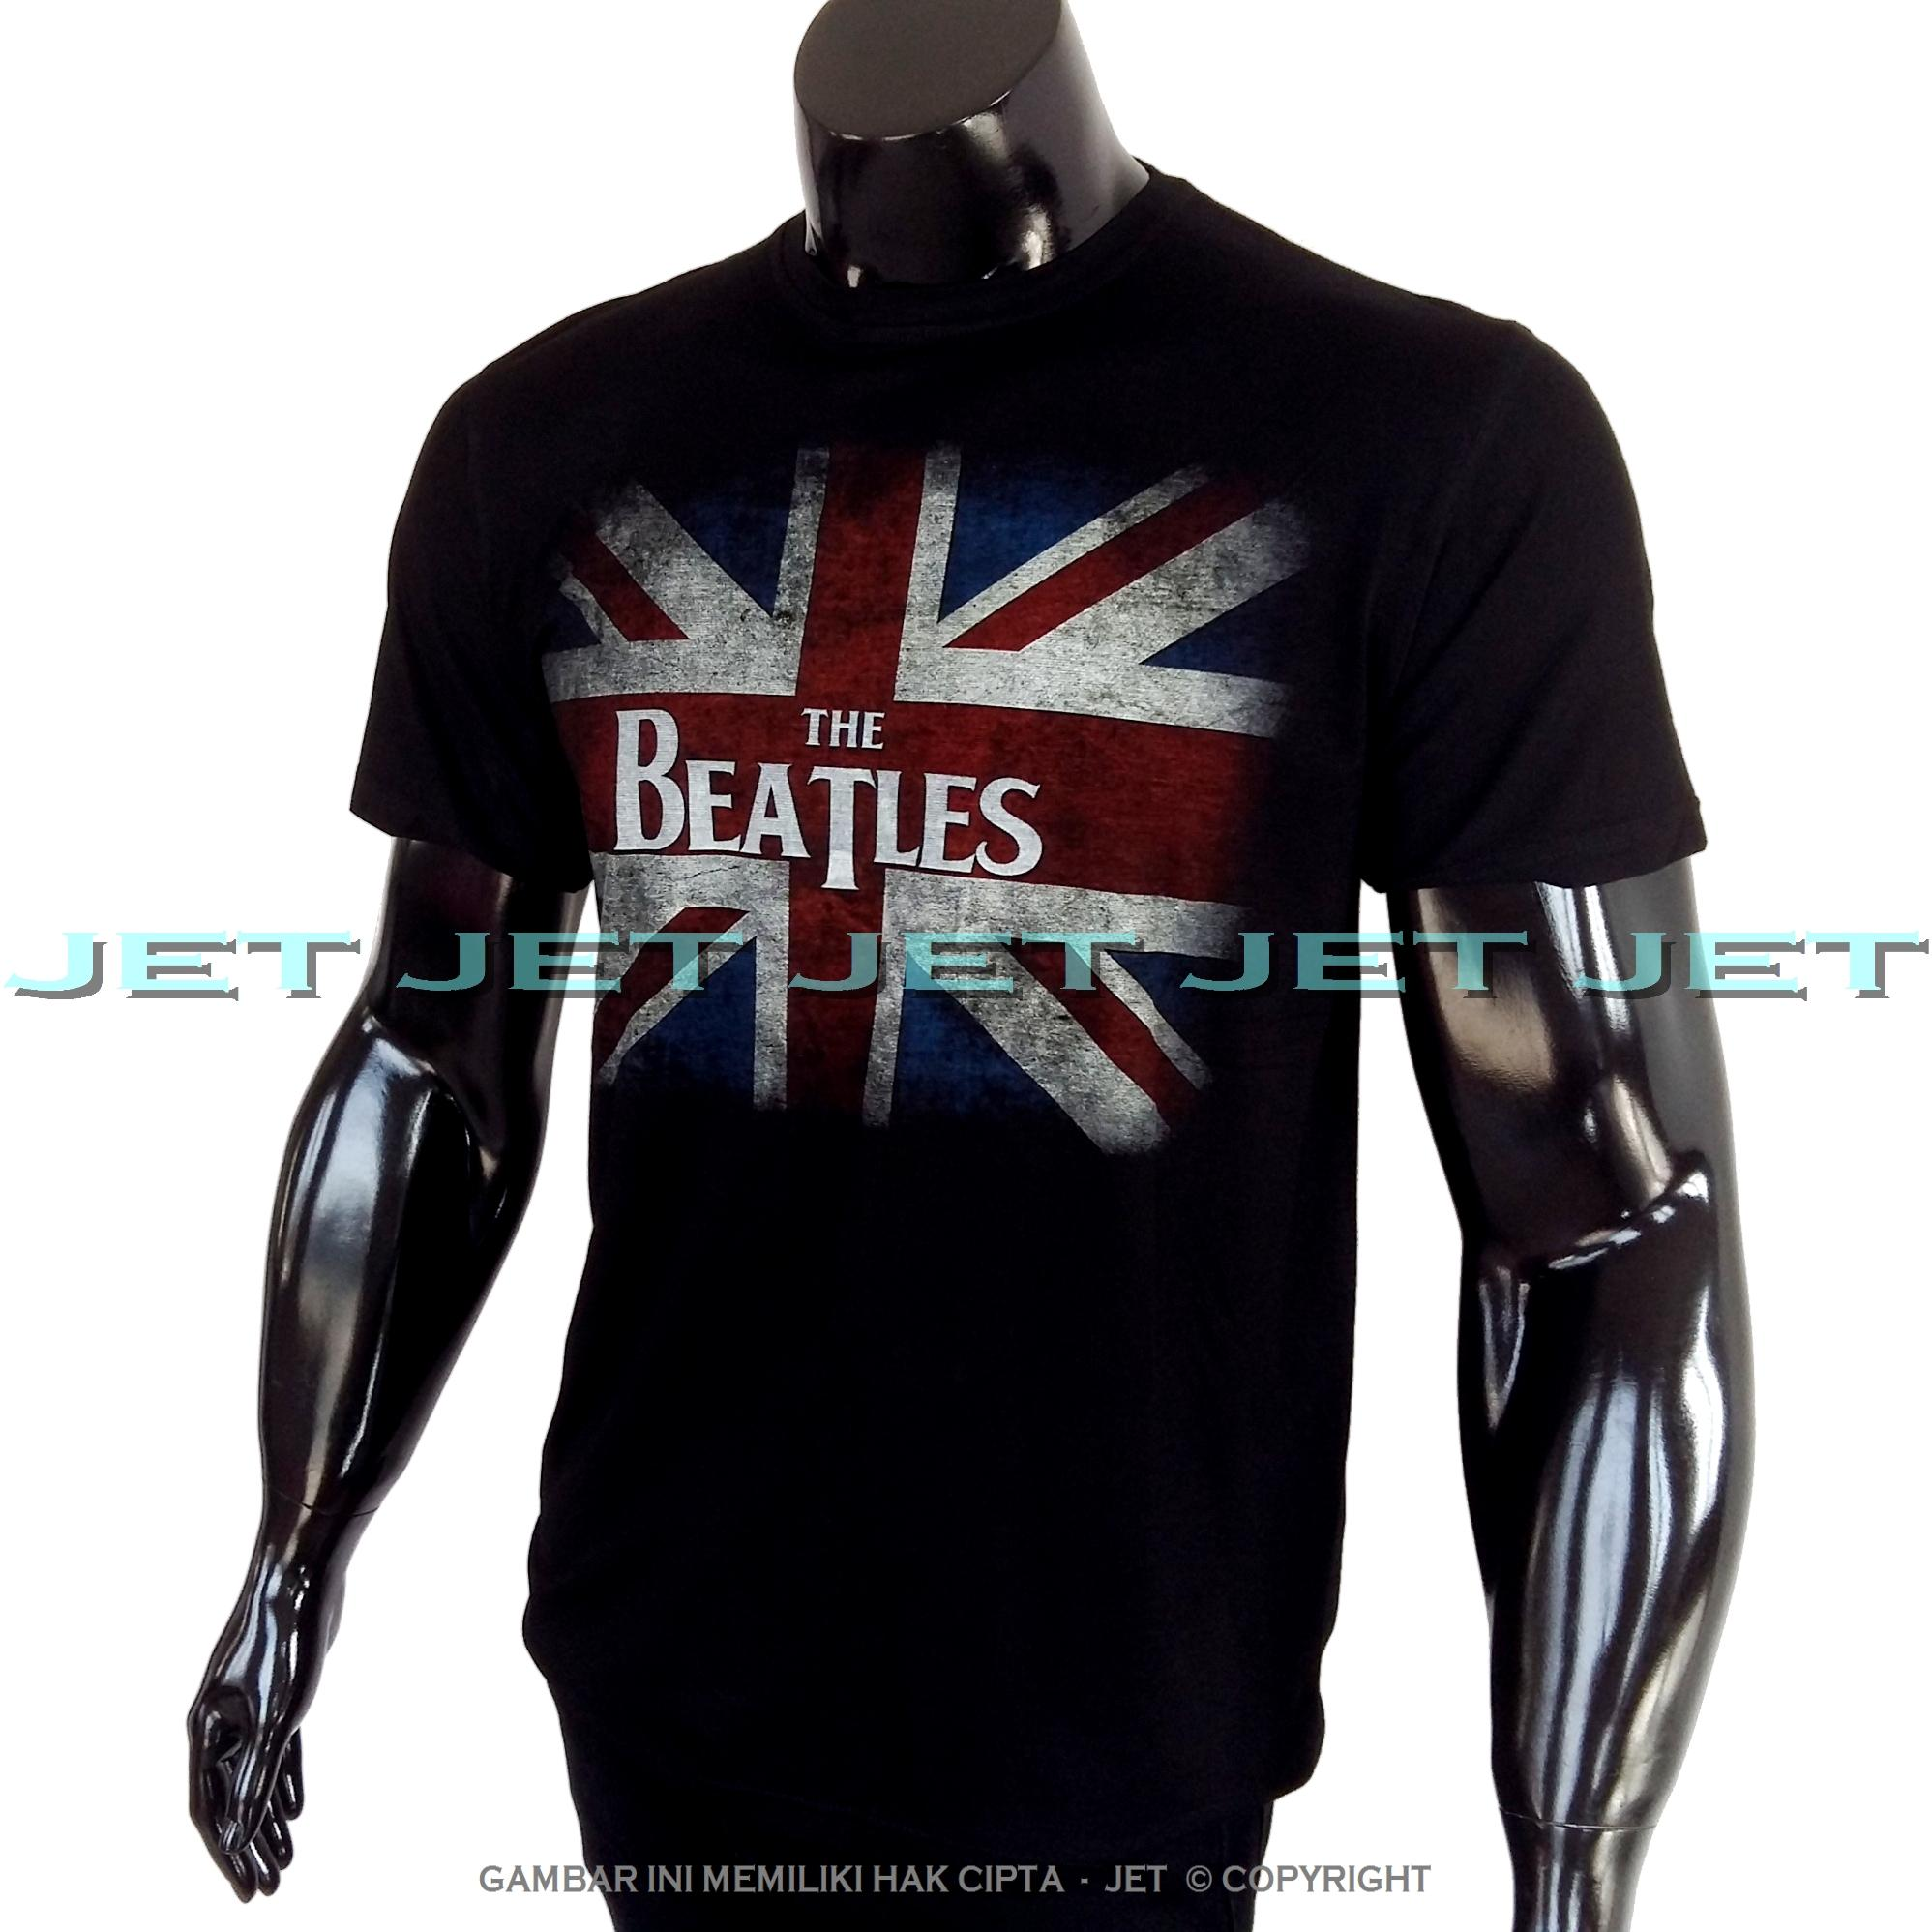 Detail Gambar JET - THE BEATLES 100% Soft Cotton Combed 30s Kaos Distro Fashion T-Shirt Atasan Oblong Baju Pakaian Polos Shirt Pria Wanita Cewe Cowo Lengan ...